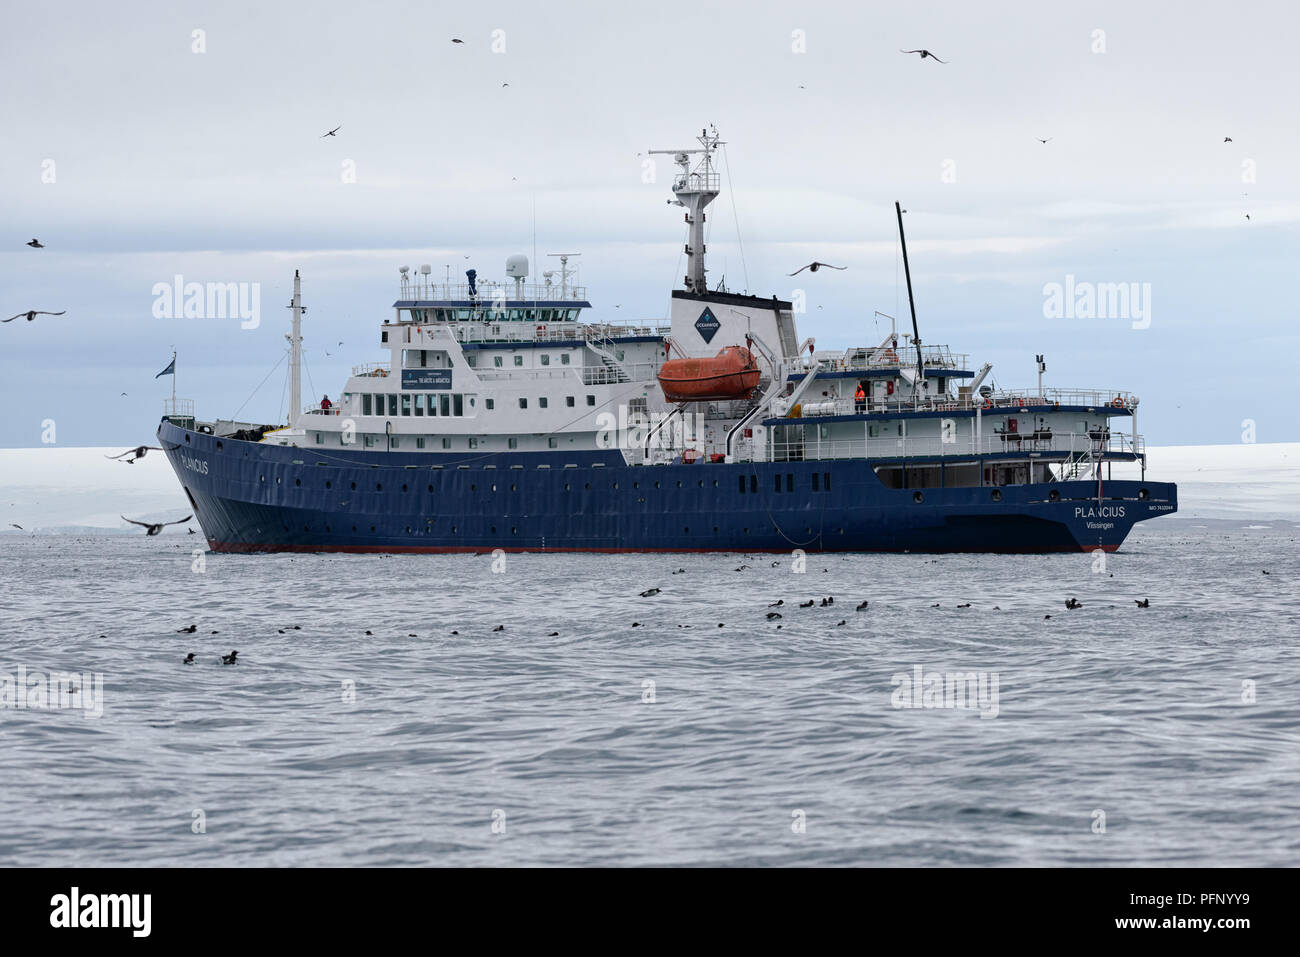 Cruise ship with birds near Alkefjellet, Hinlopenstretet, Svalbard, Norway Stock Photo